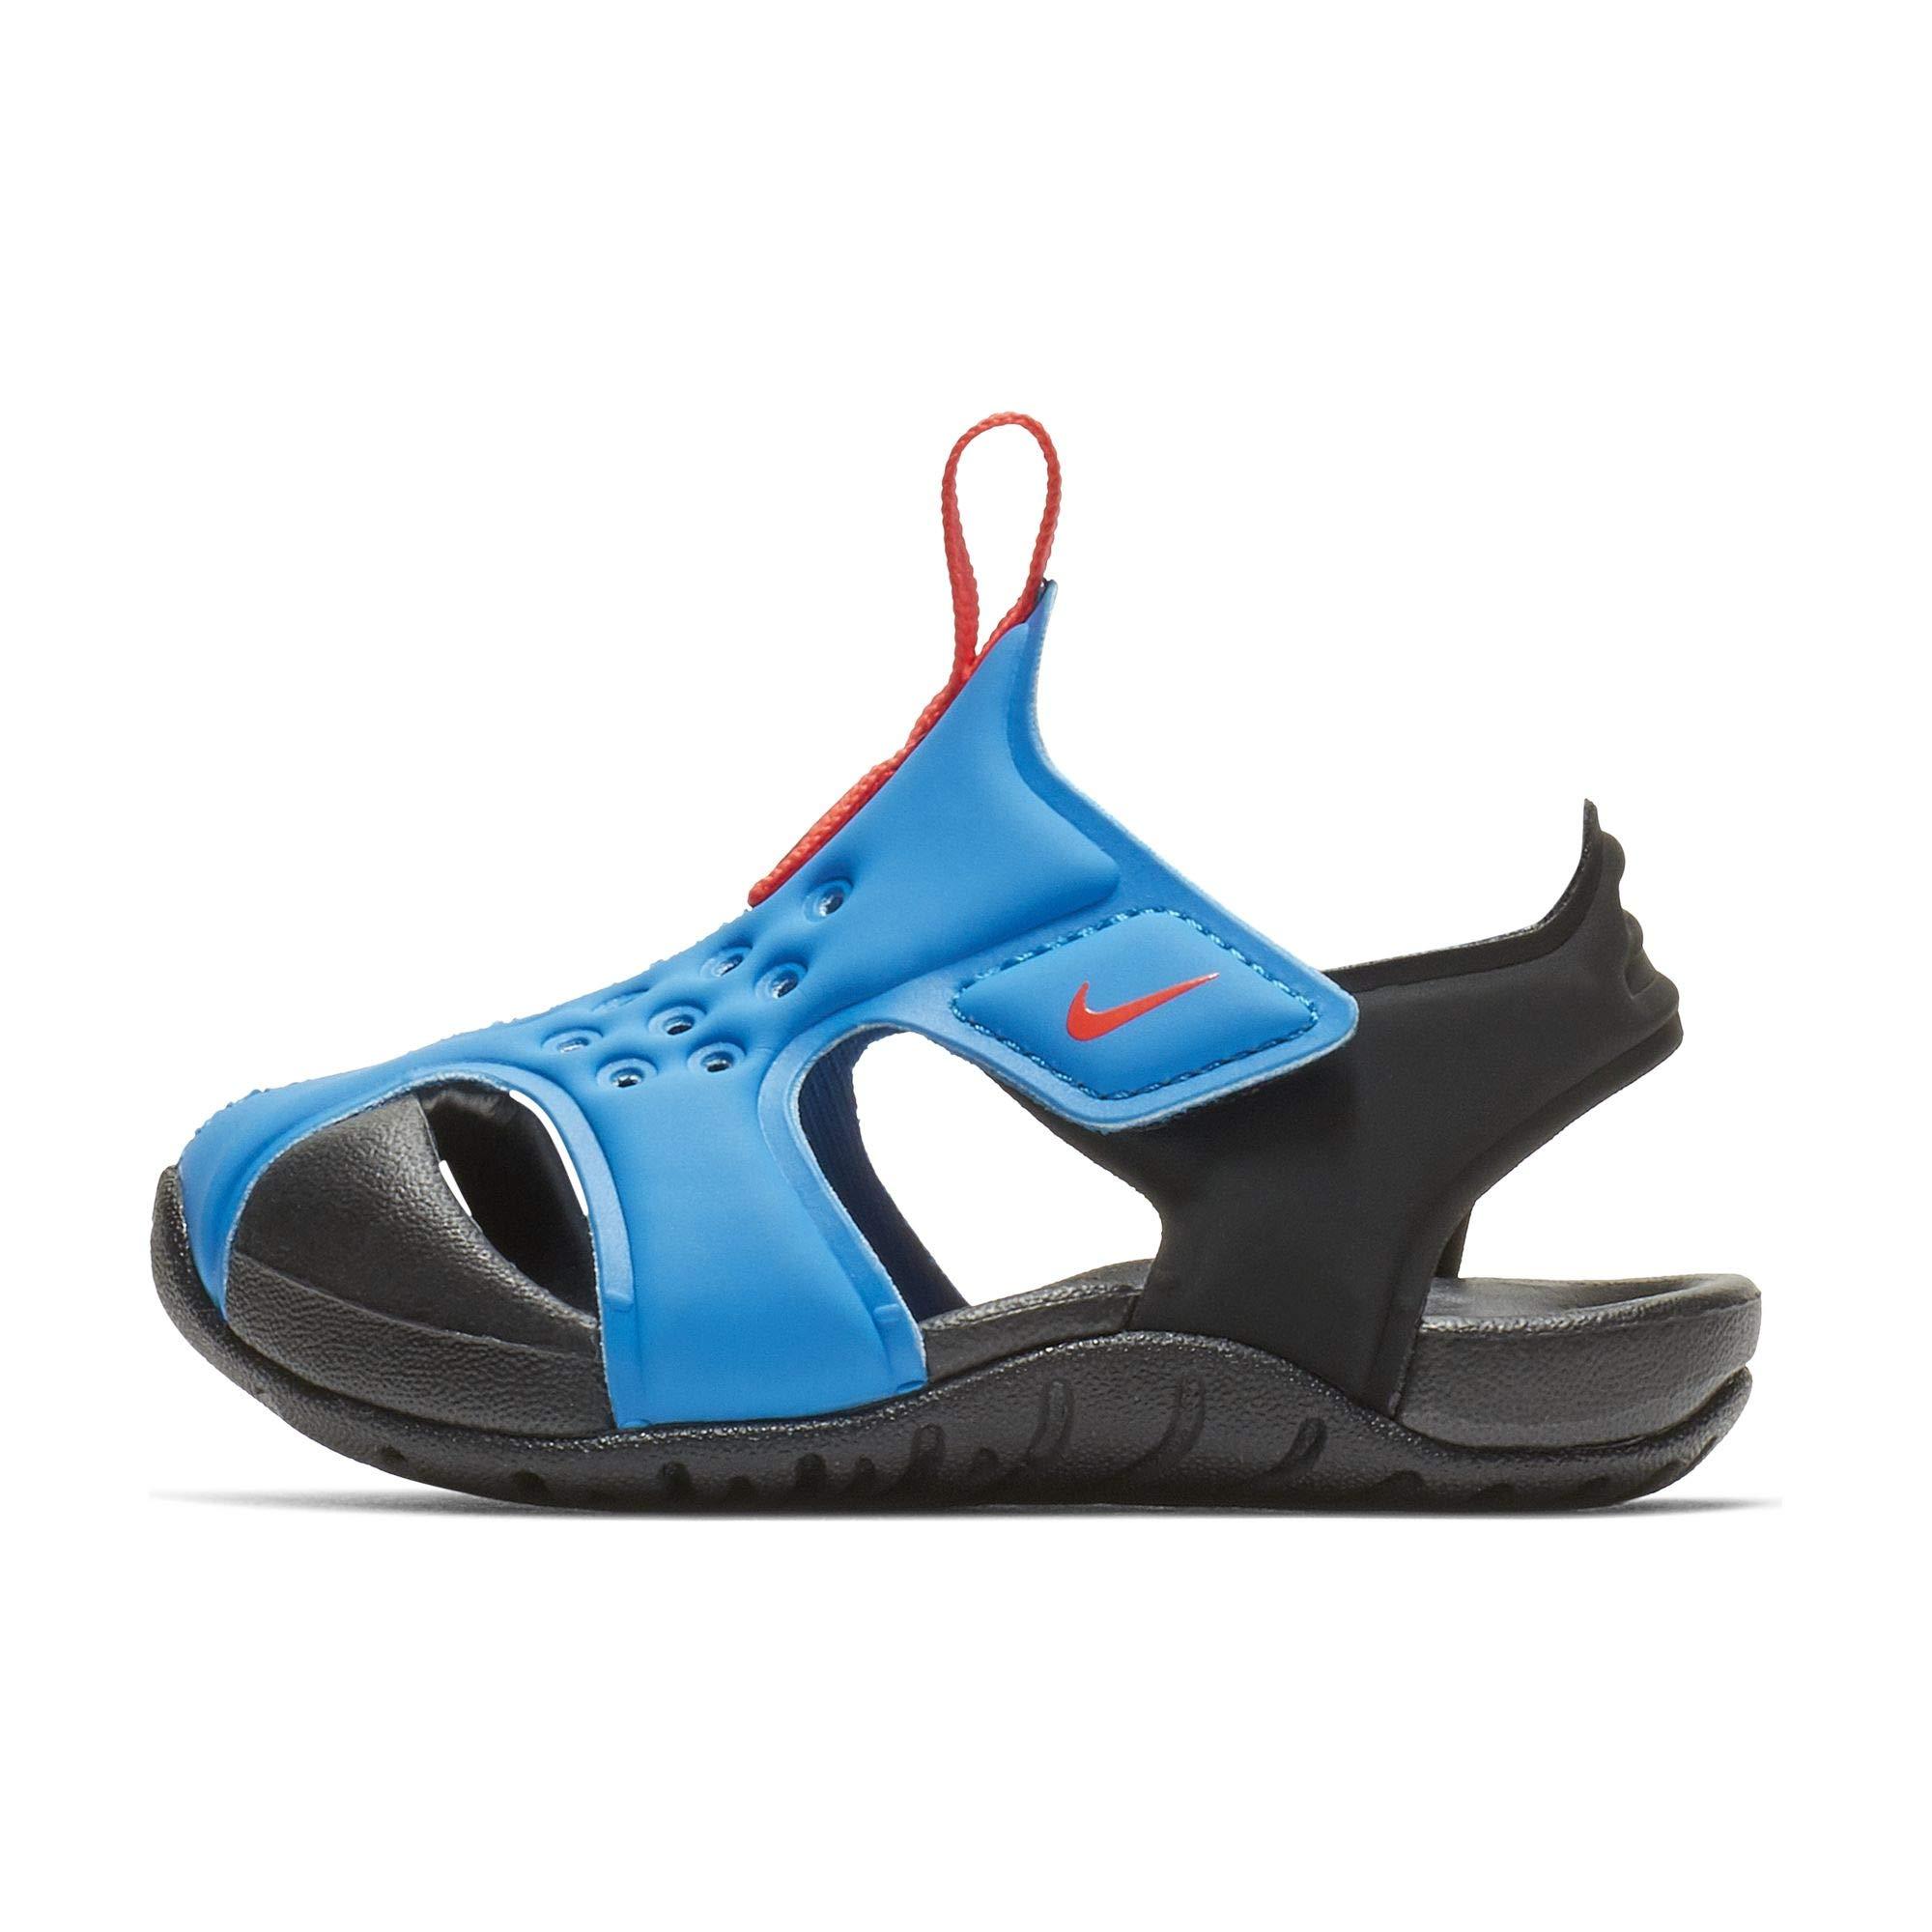 Nike Toddler Kid's Sunray Protect 2 Sandal, Photo Blue/Bright Crimson-Black, 9 M US Toddler